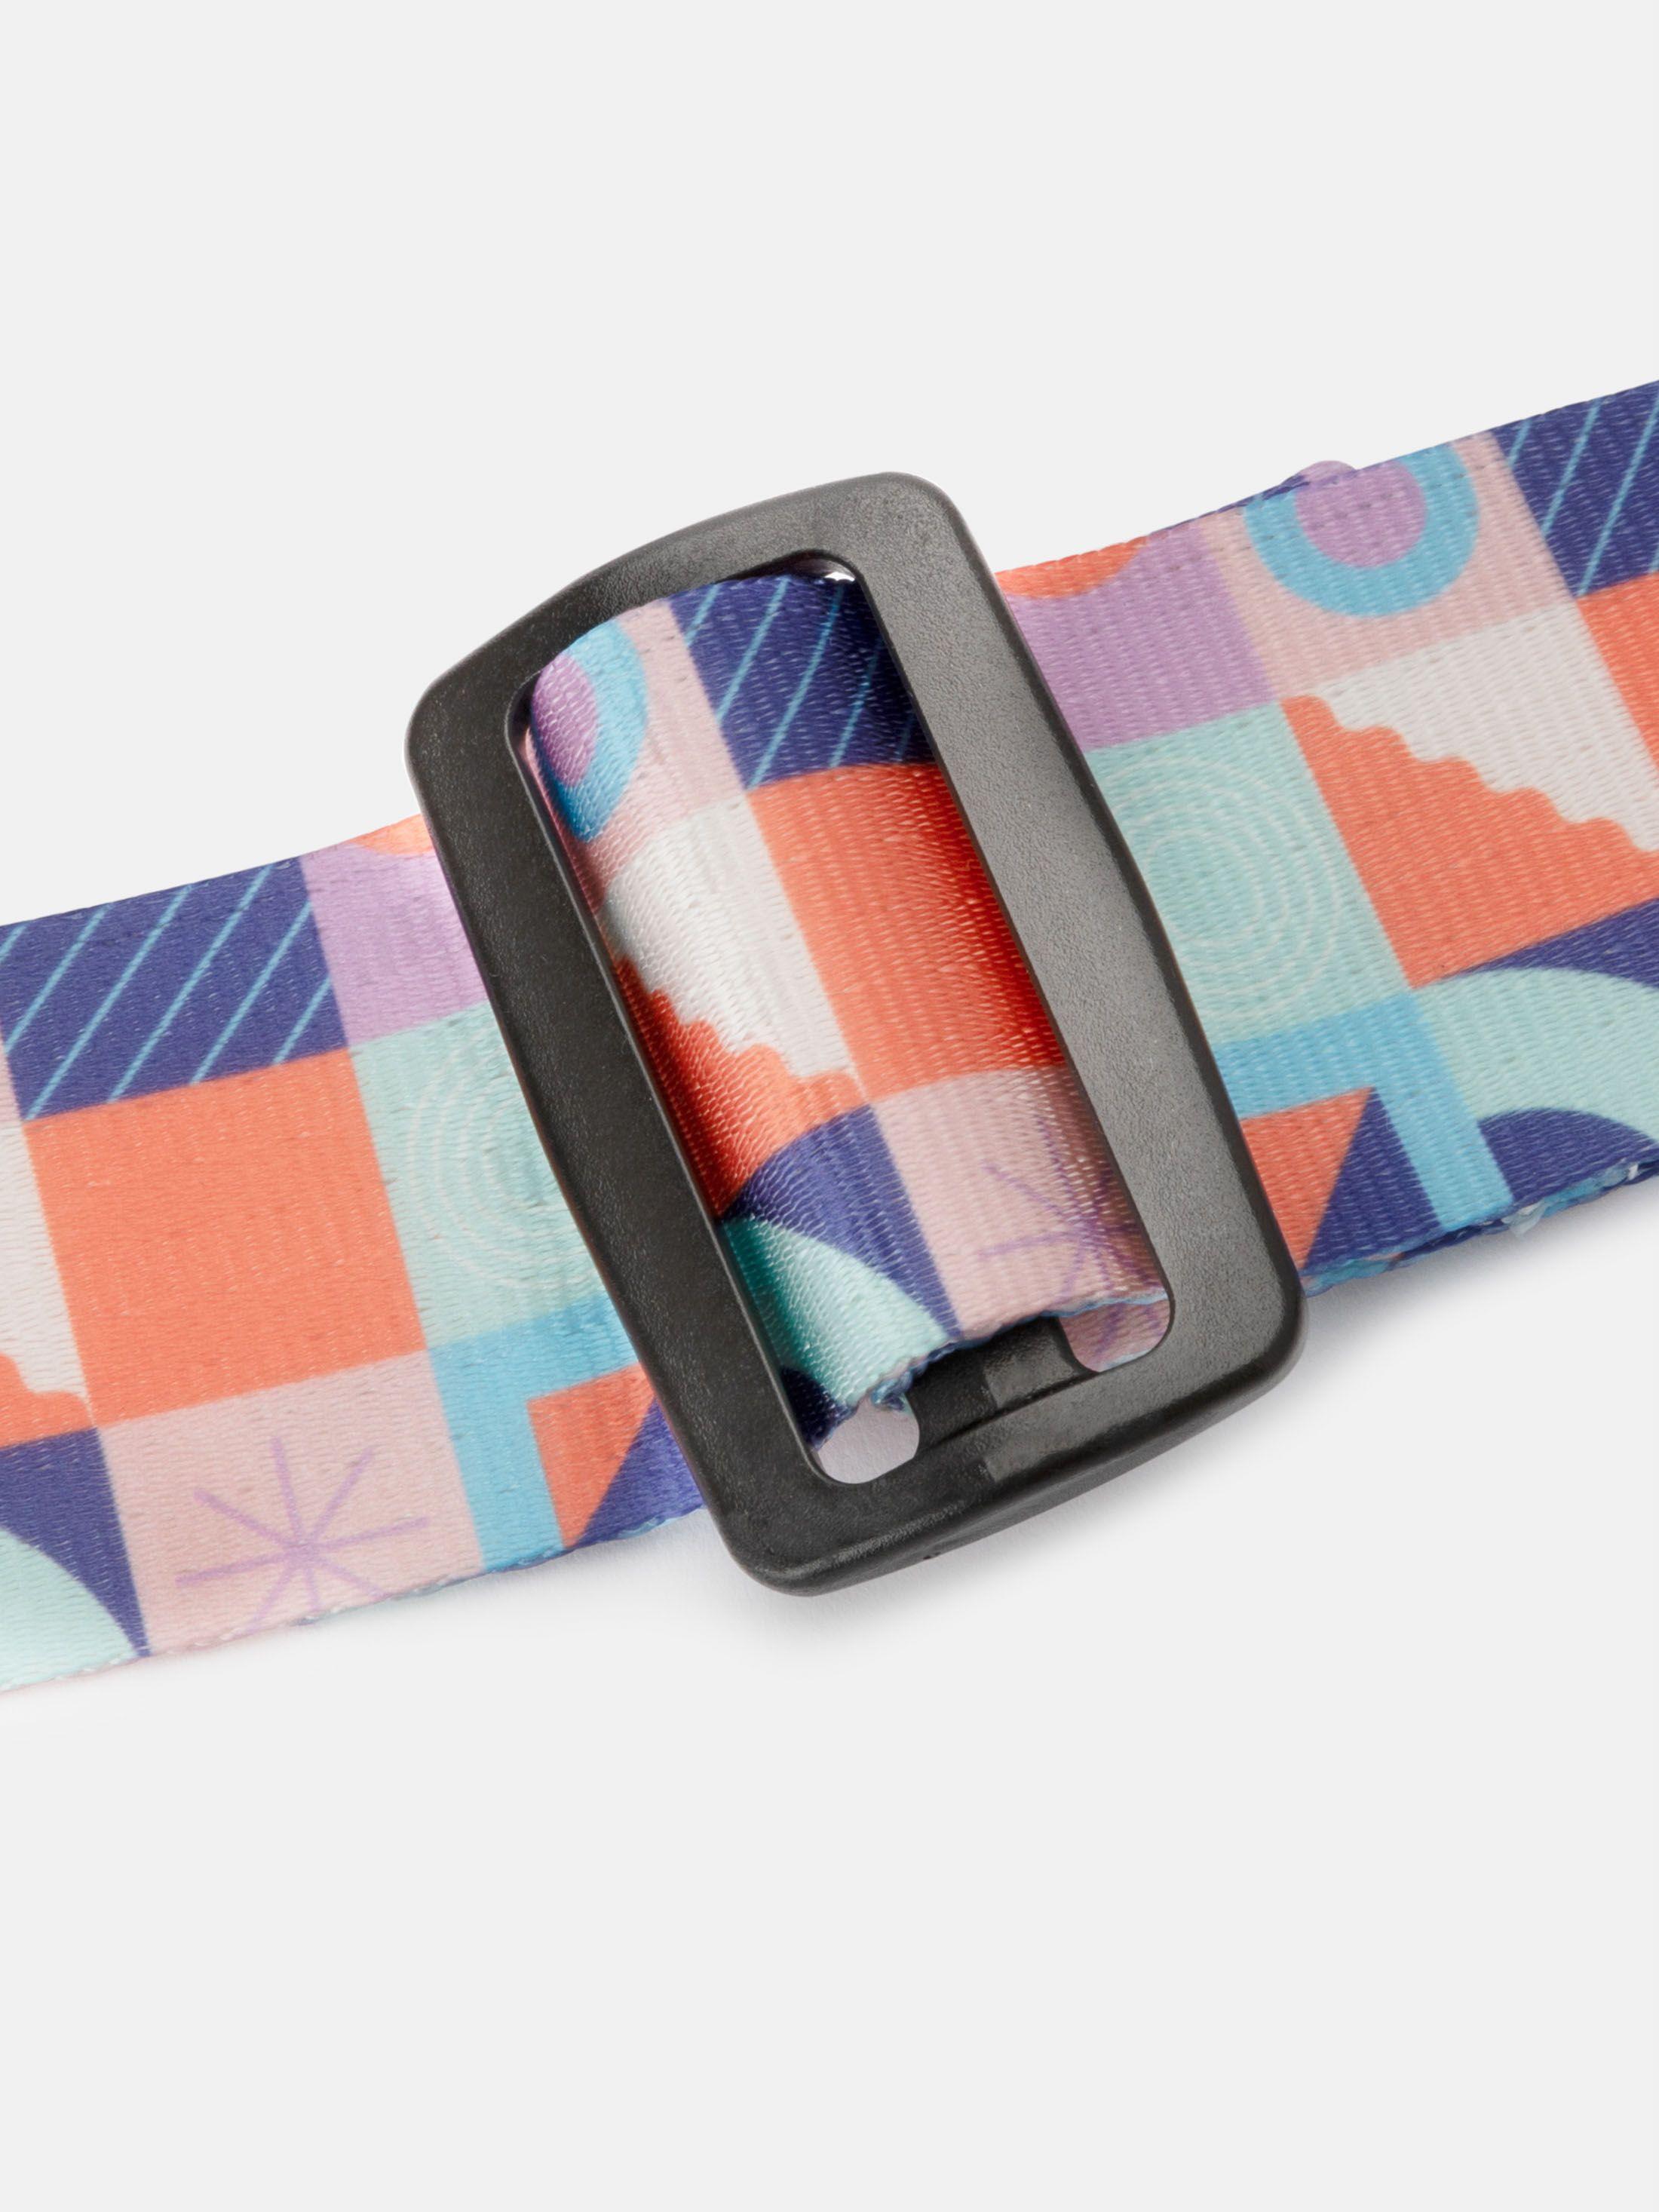 suitcase straps webbing detail